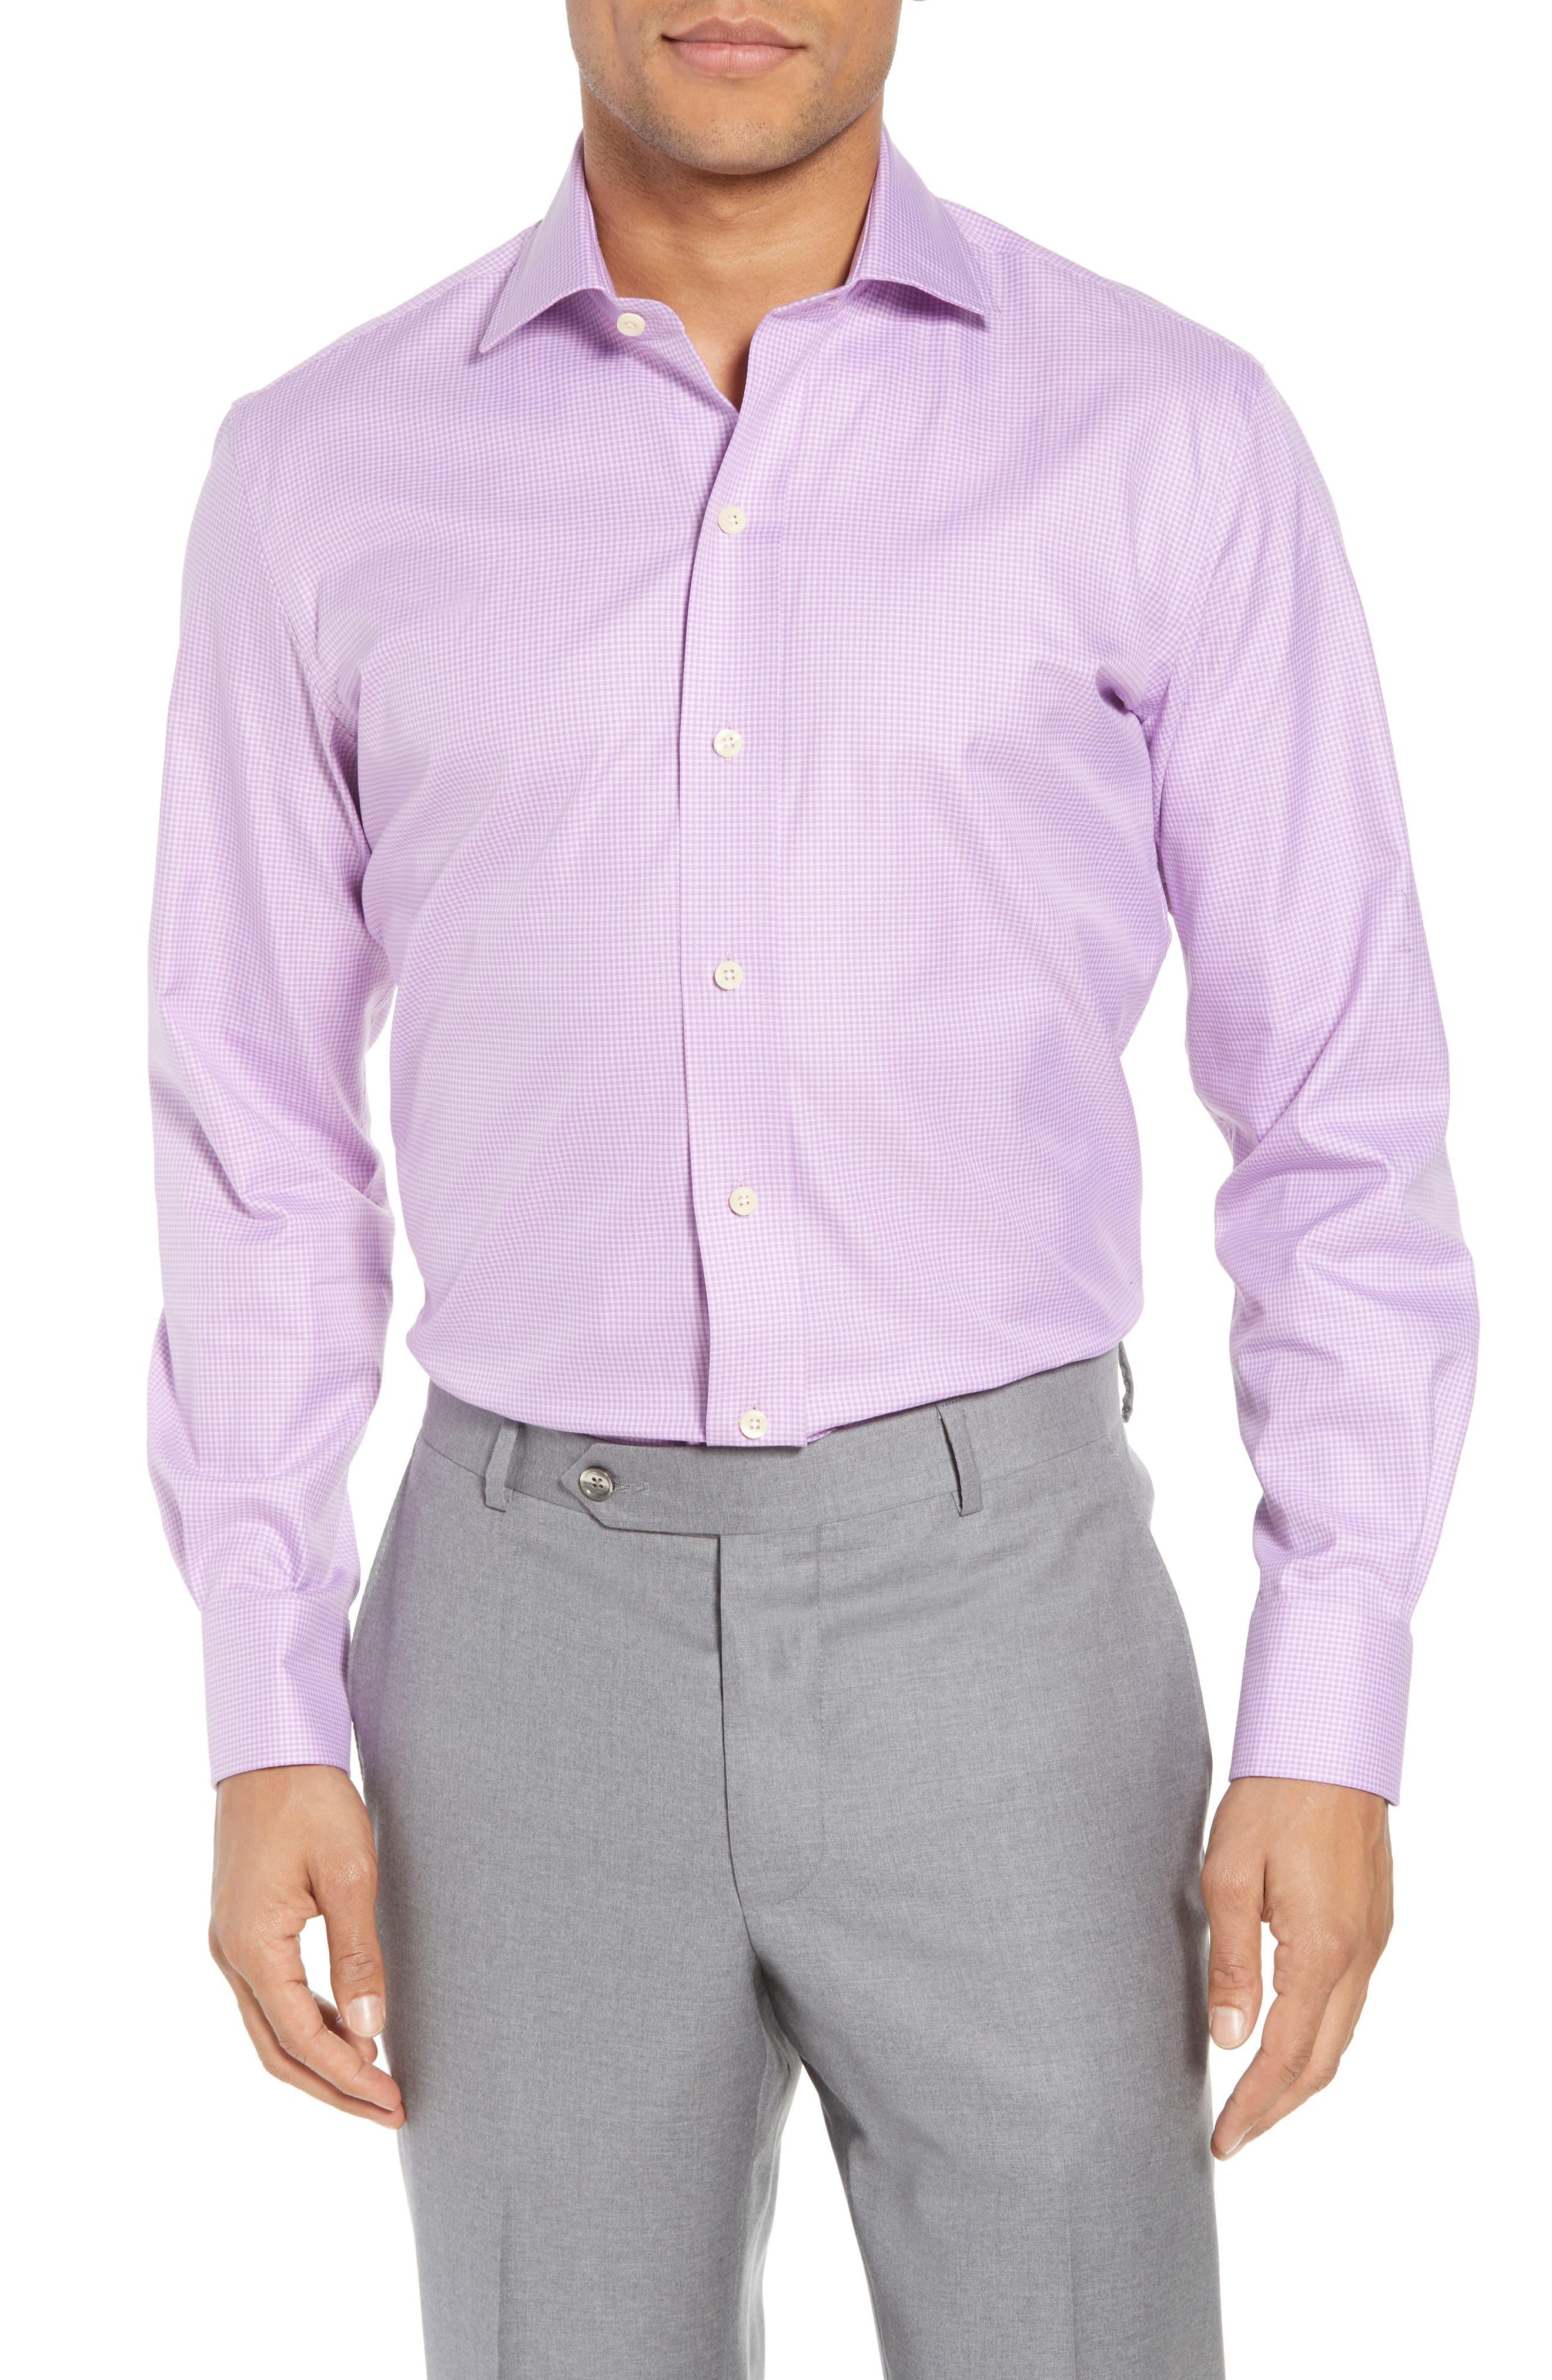 Innis Slim Fit Check Dress Shirt,                             Main thumbnail 1, color,                             Lilac